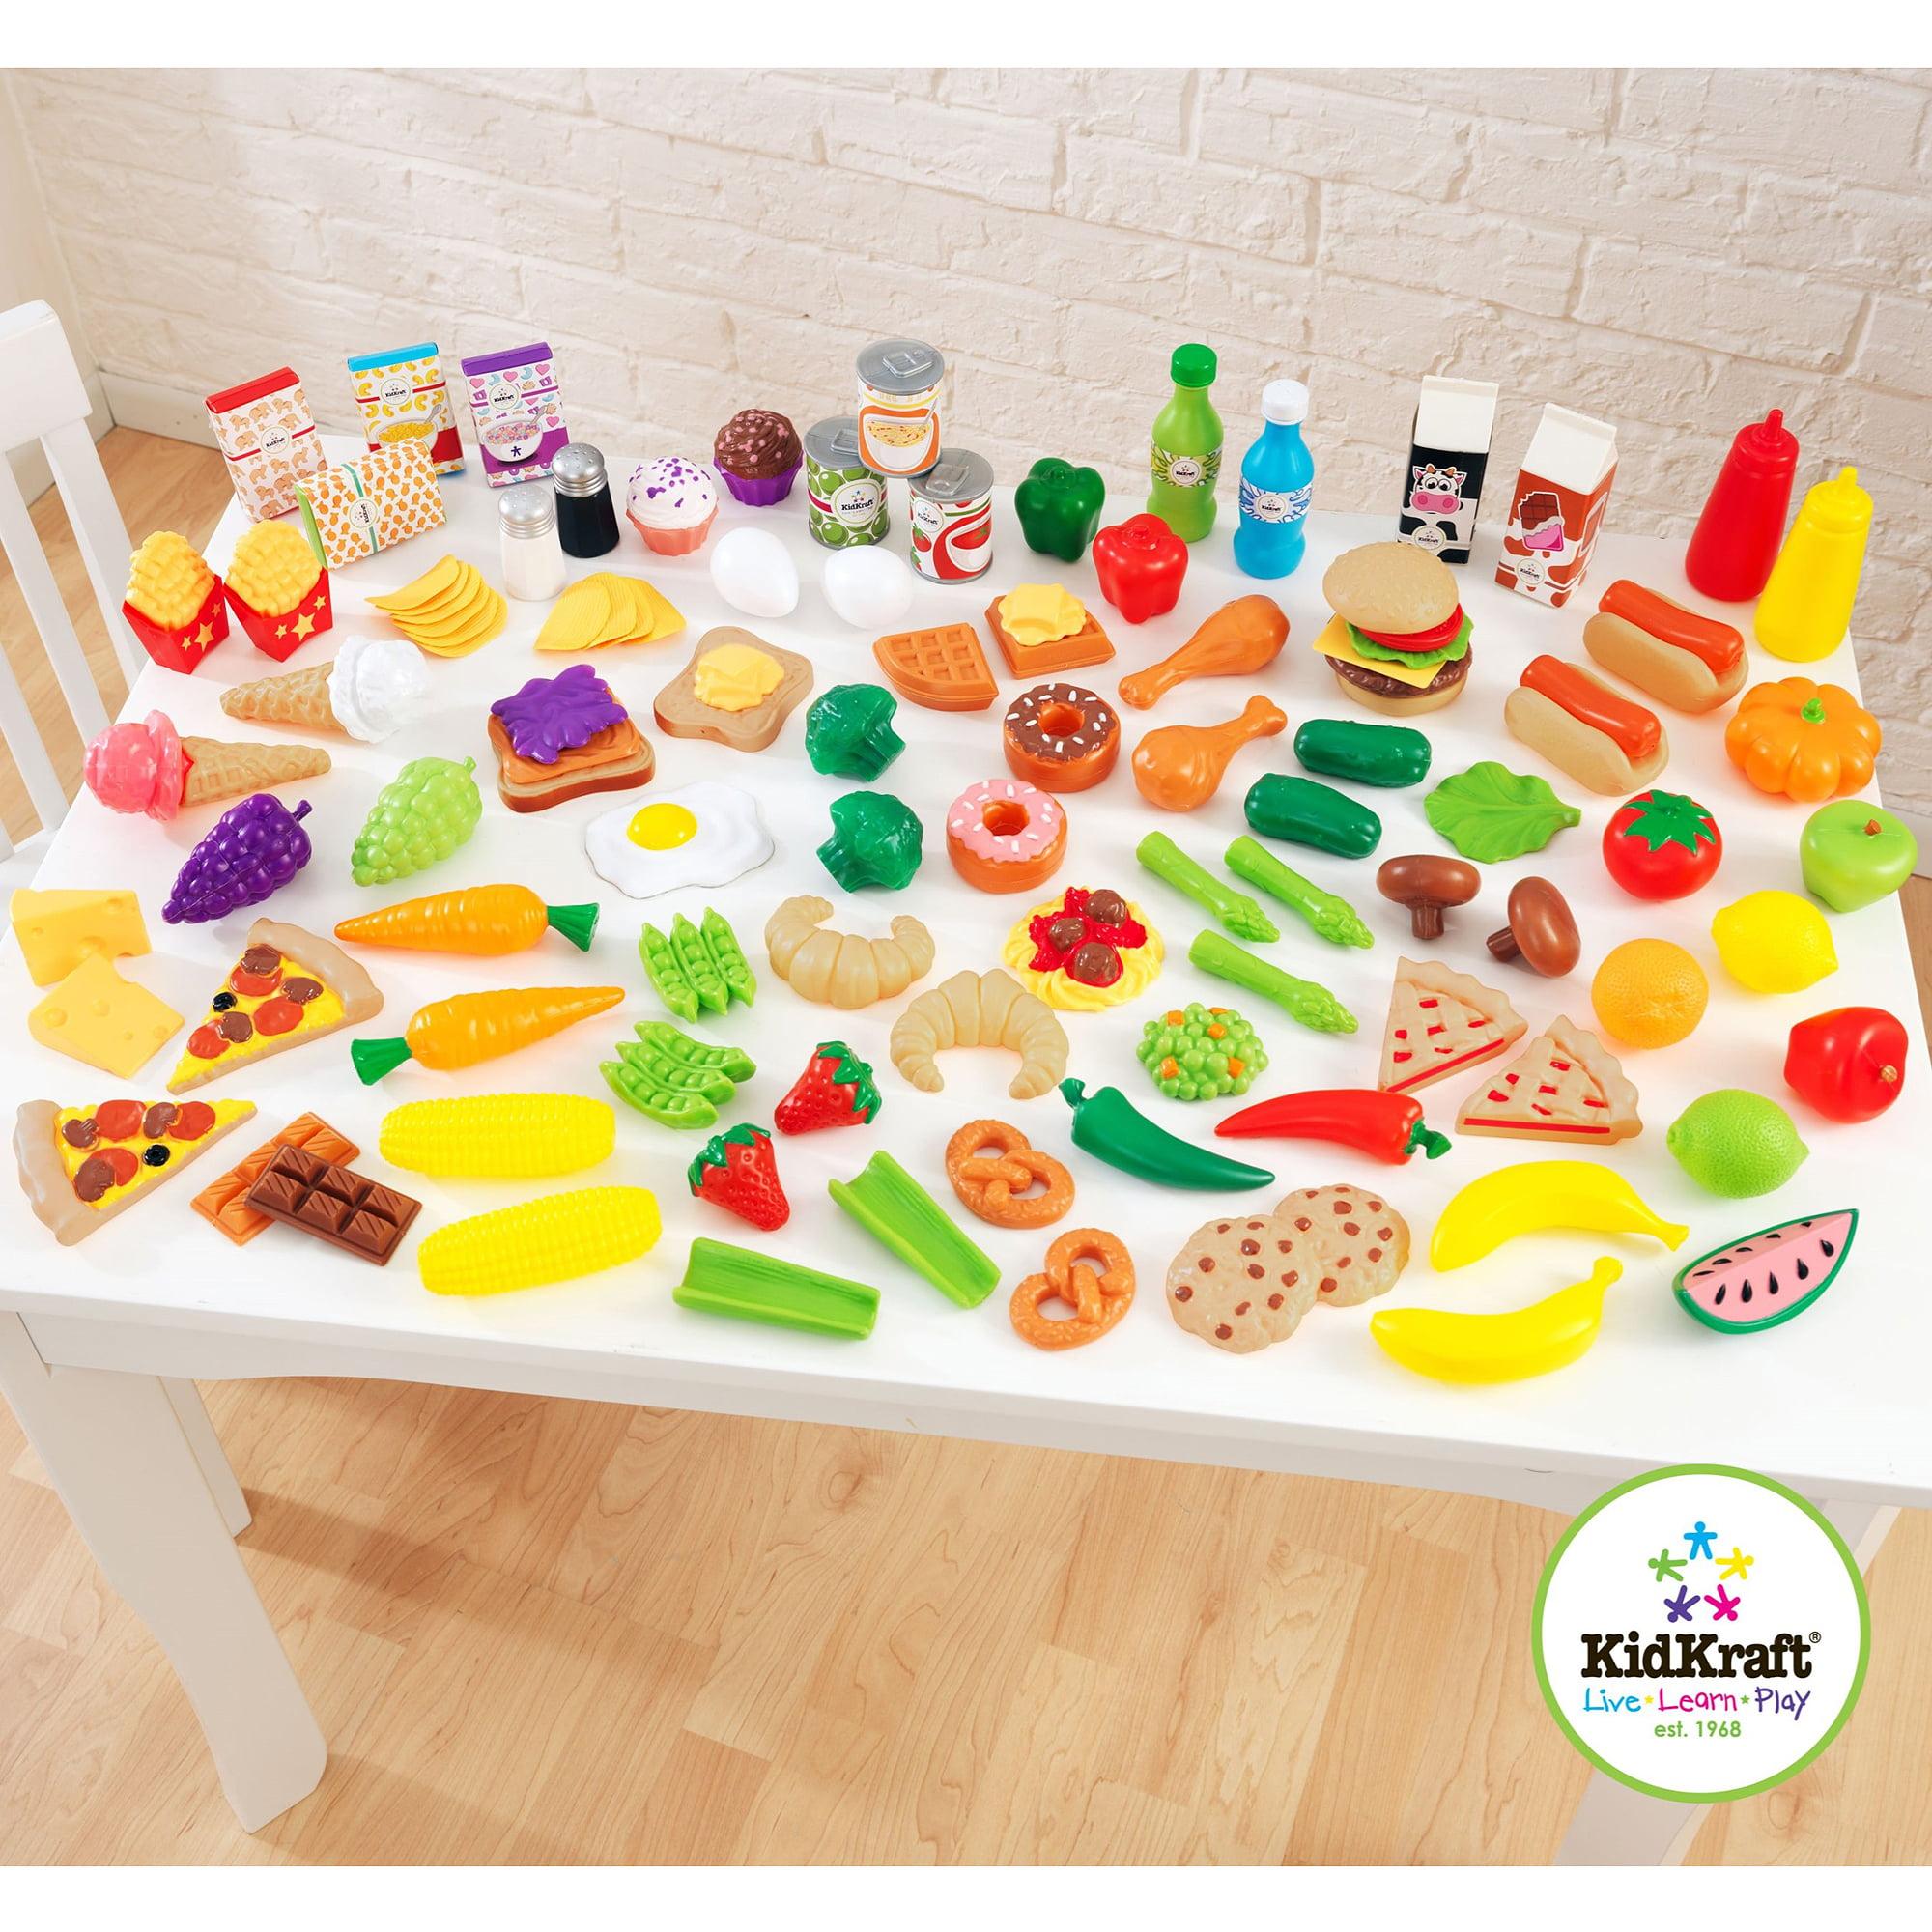 KidKraft Tasty Treats Play food Set, 115 Pieces